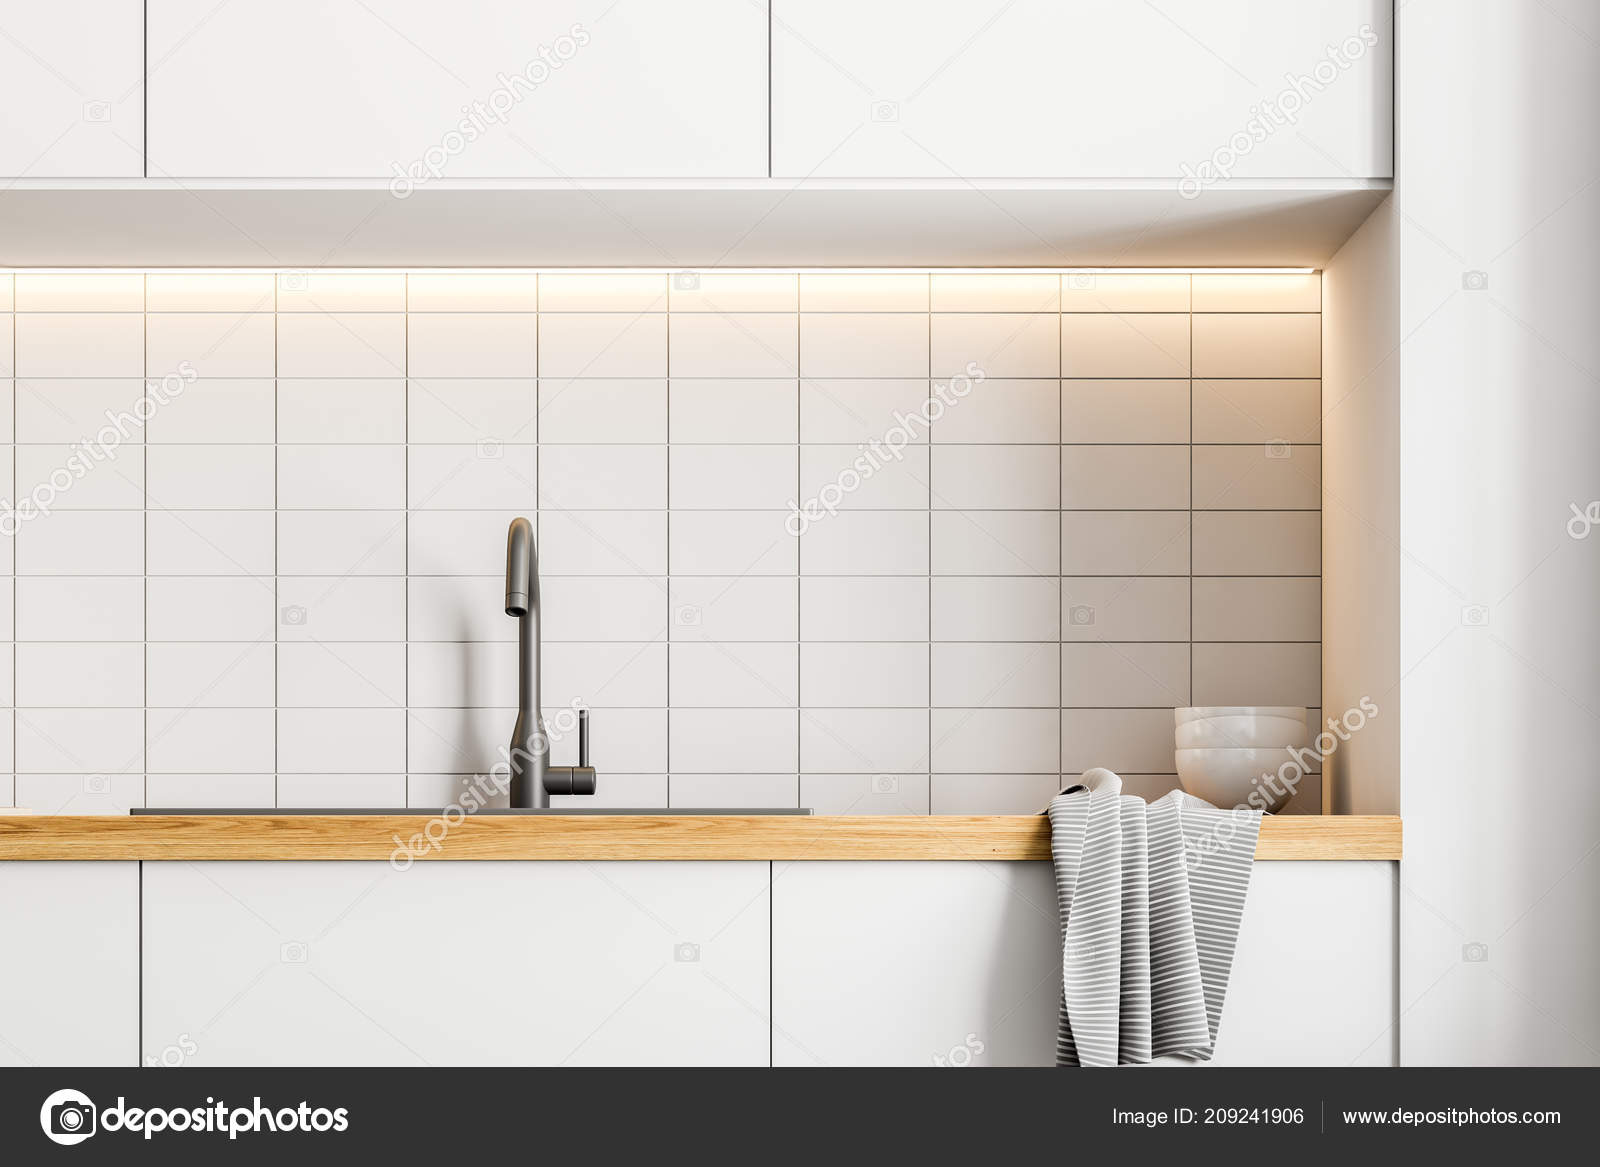 blanco kitchen sink wood chairs 关闭一个厨房水槽内置白色瓷砖厨房内部的白台面渲染模拟 图库照片 图库